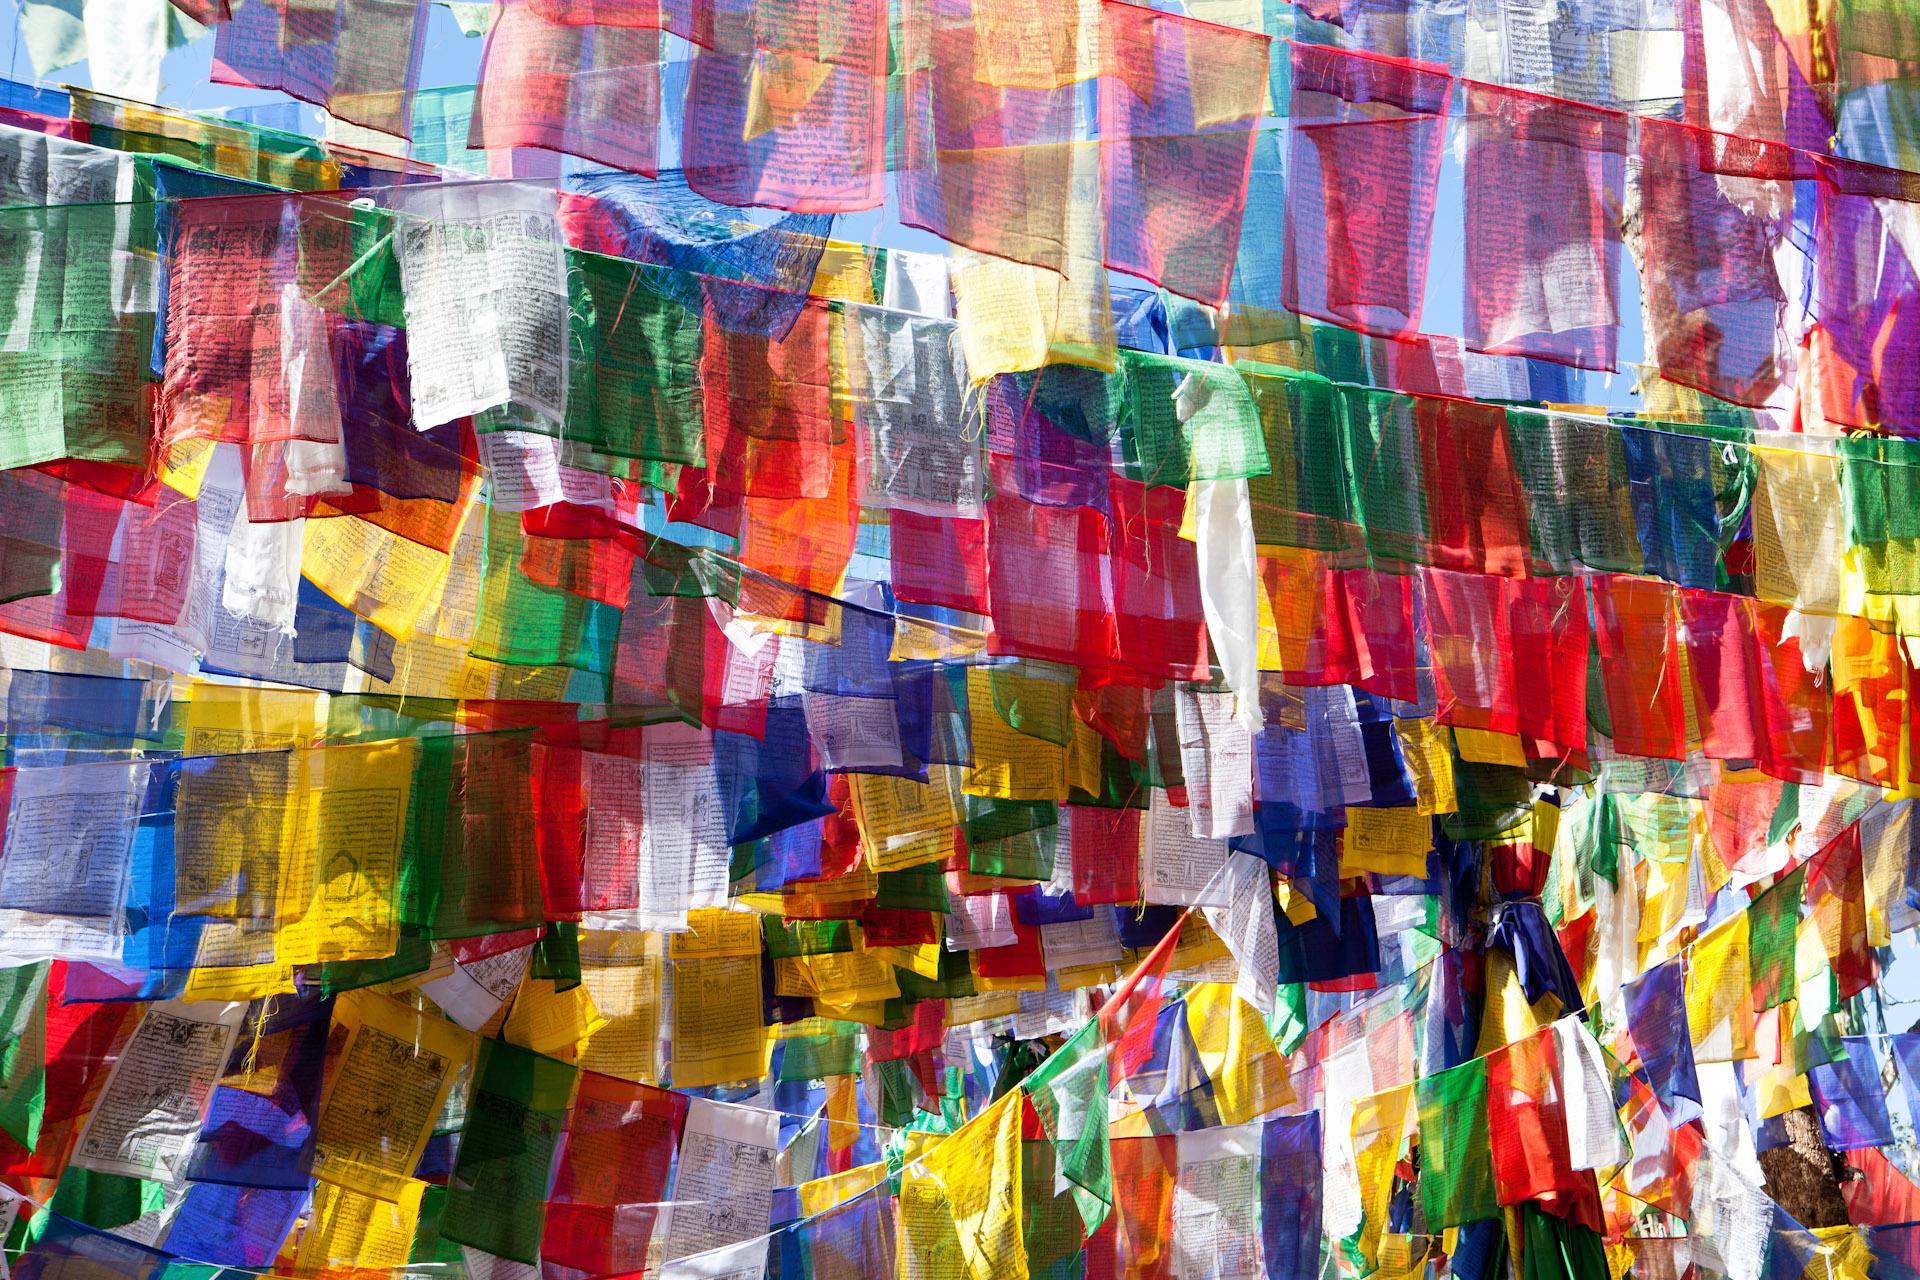 India-Darjeeling-Travel-Sikkim-Prayer-Flags-Jason-Bax.JPG